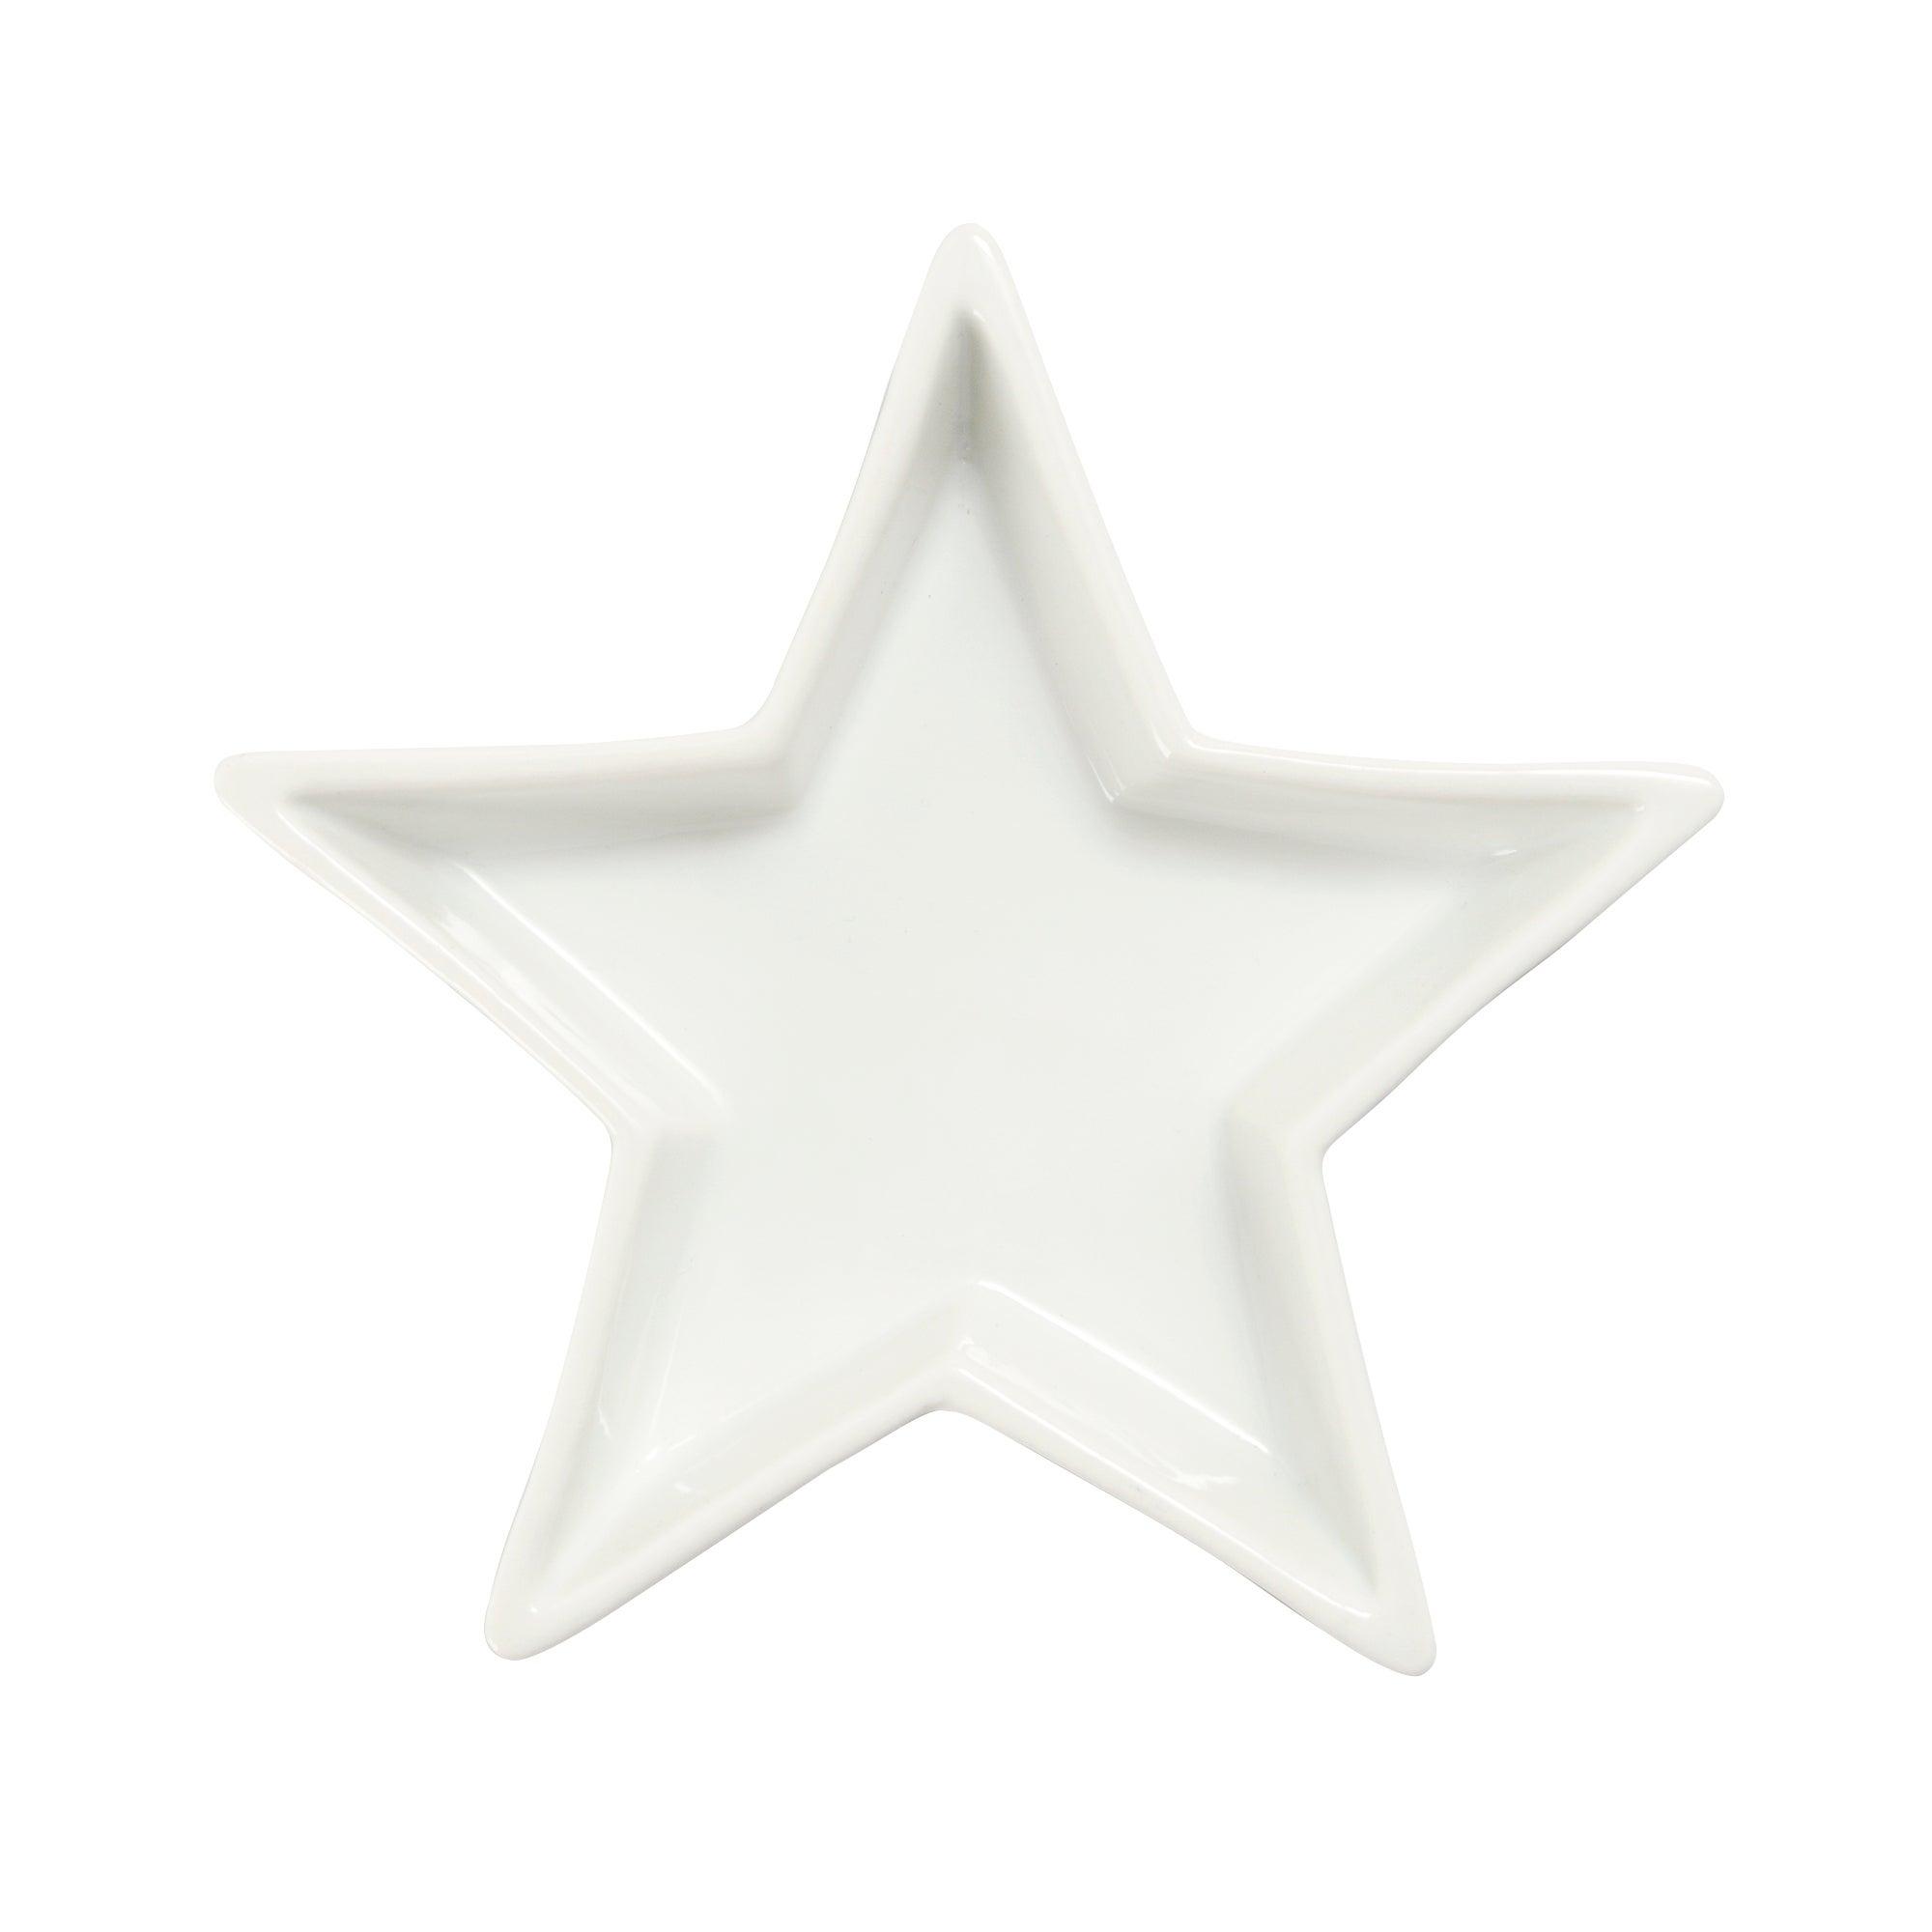 White Star Serving Dish